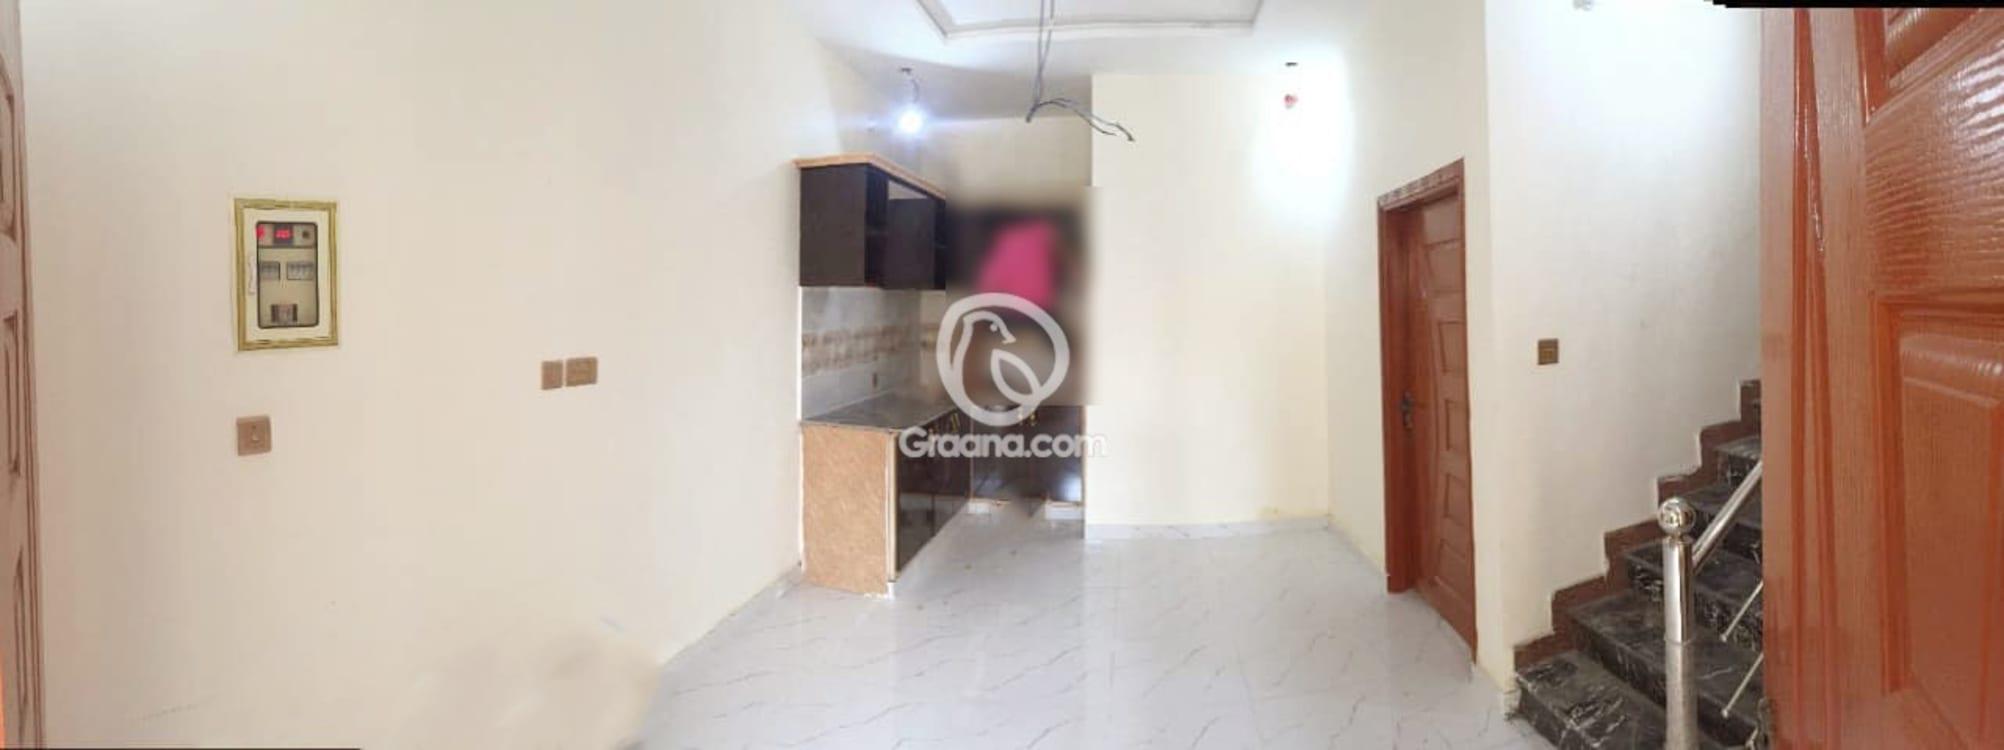 3.5 Marla House For Sale | Graana.com